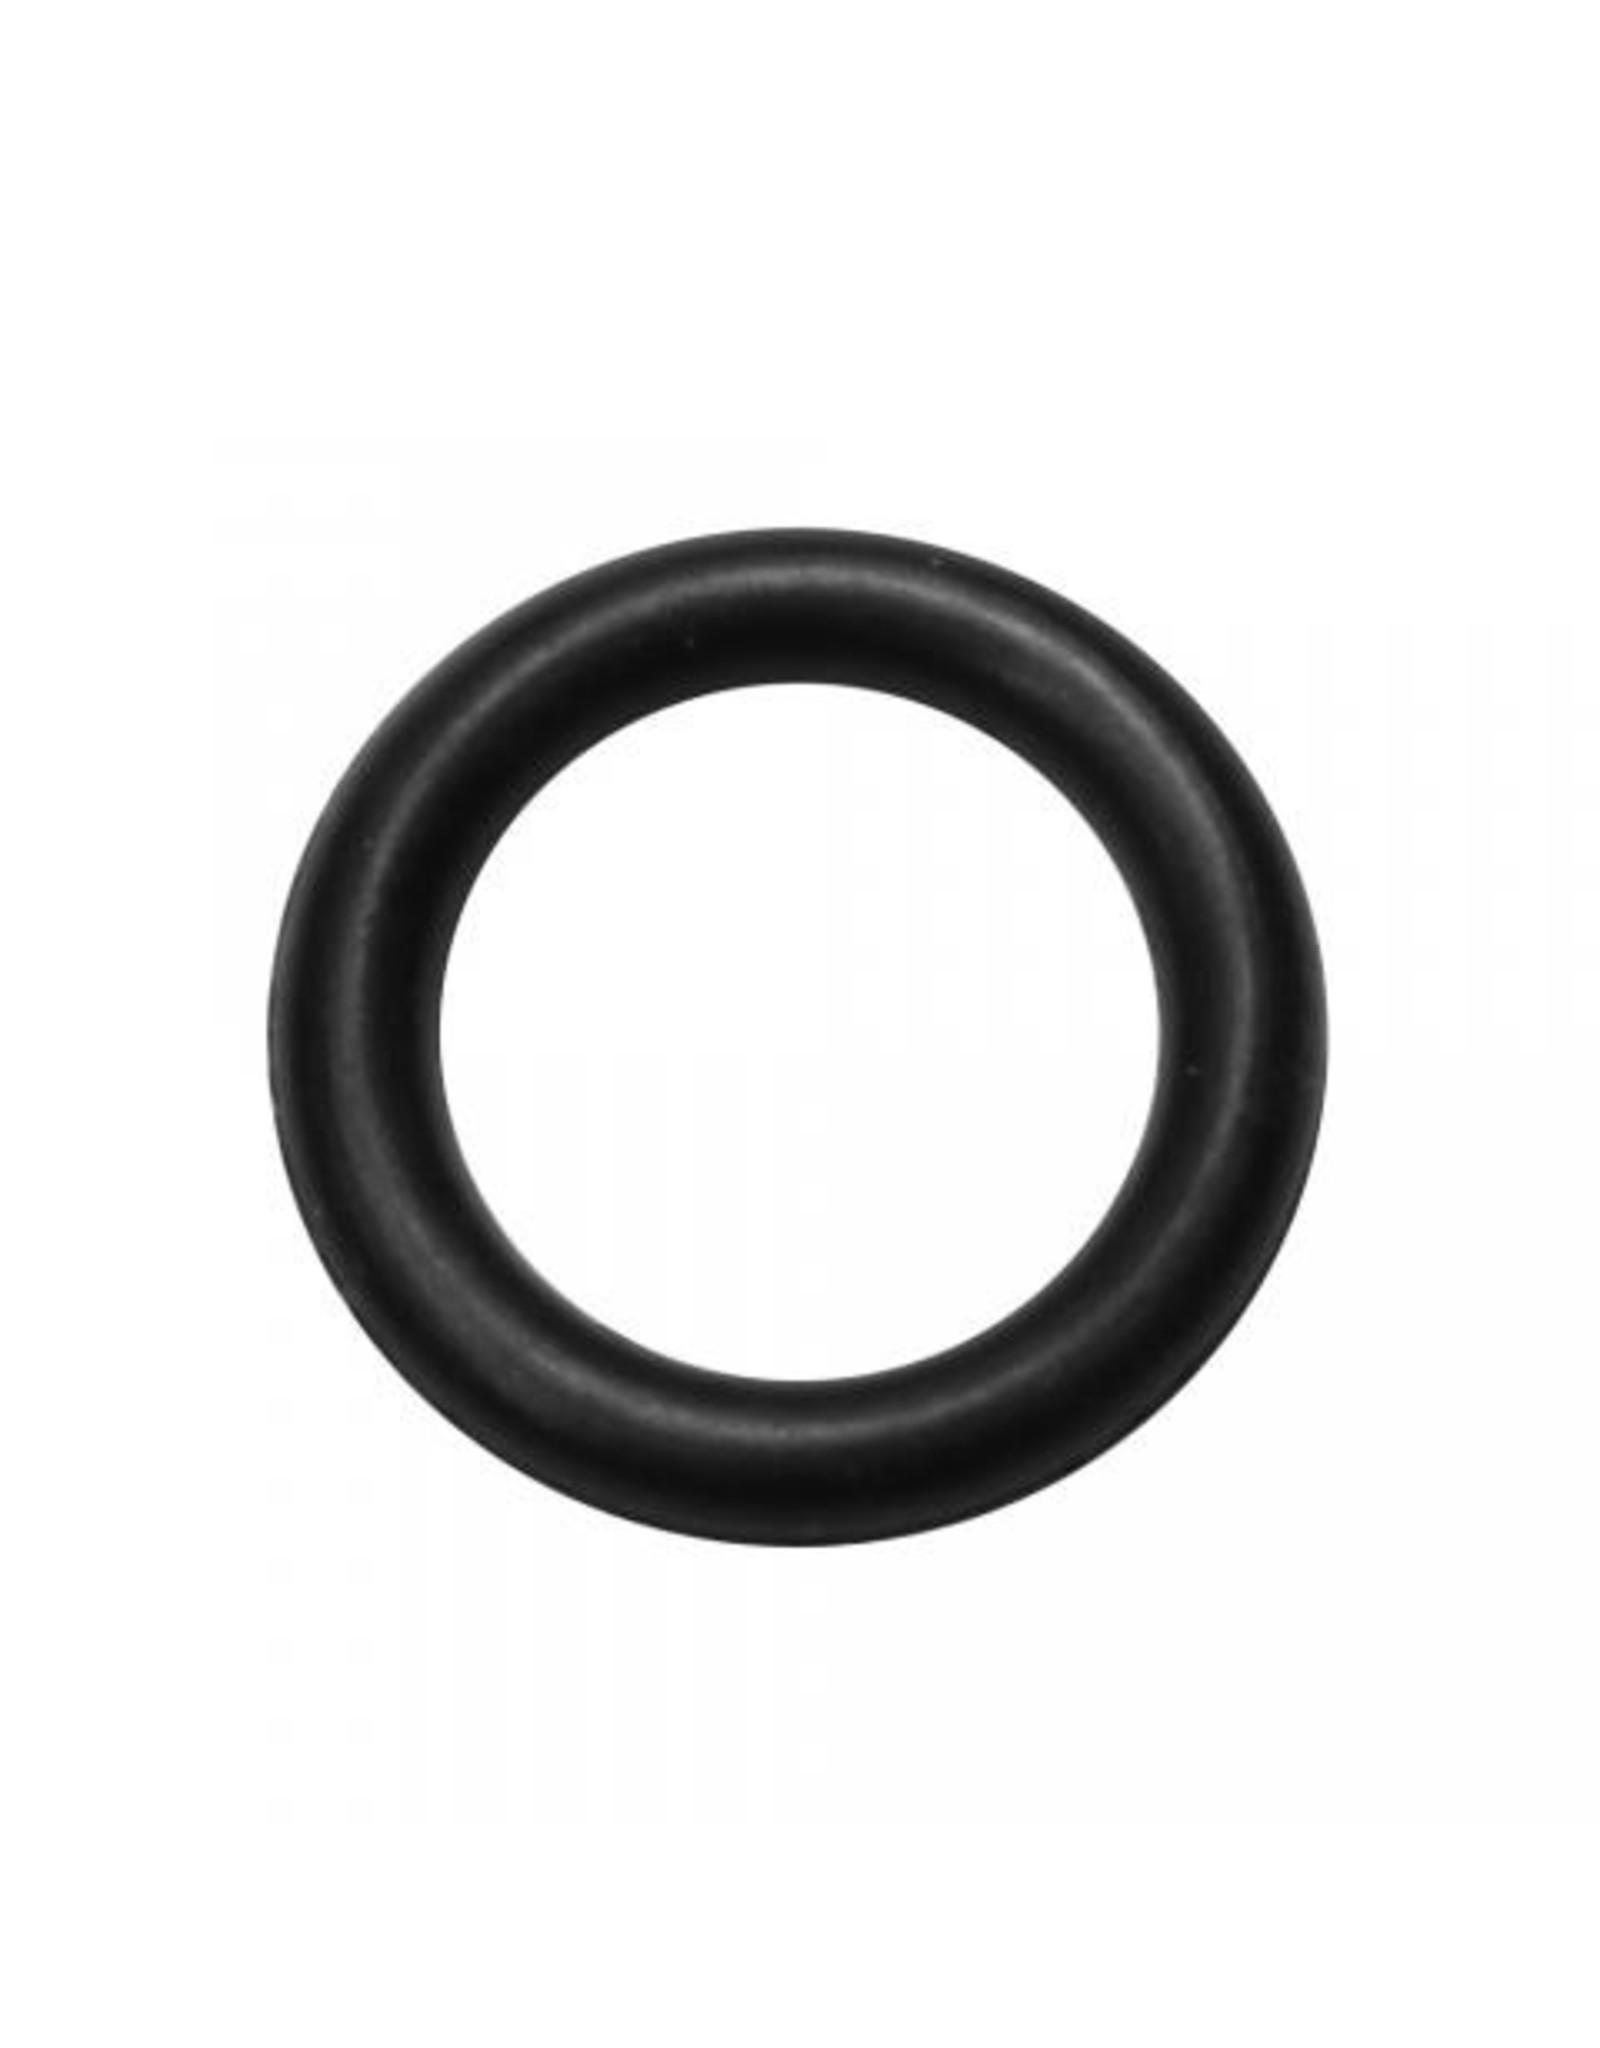 O-Ring Dip Tube Thin Firestone